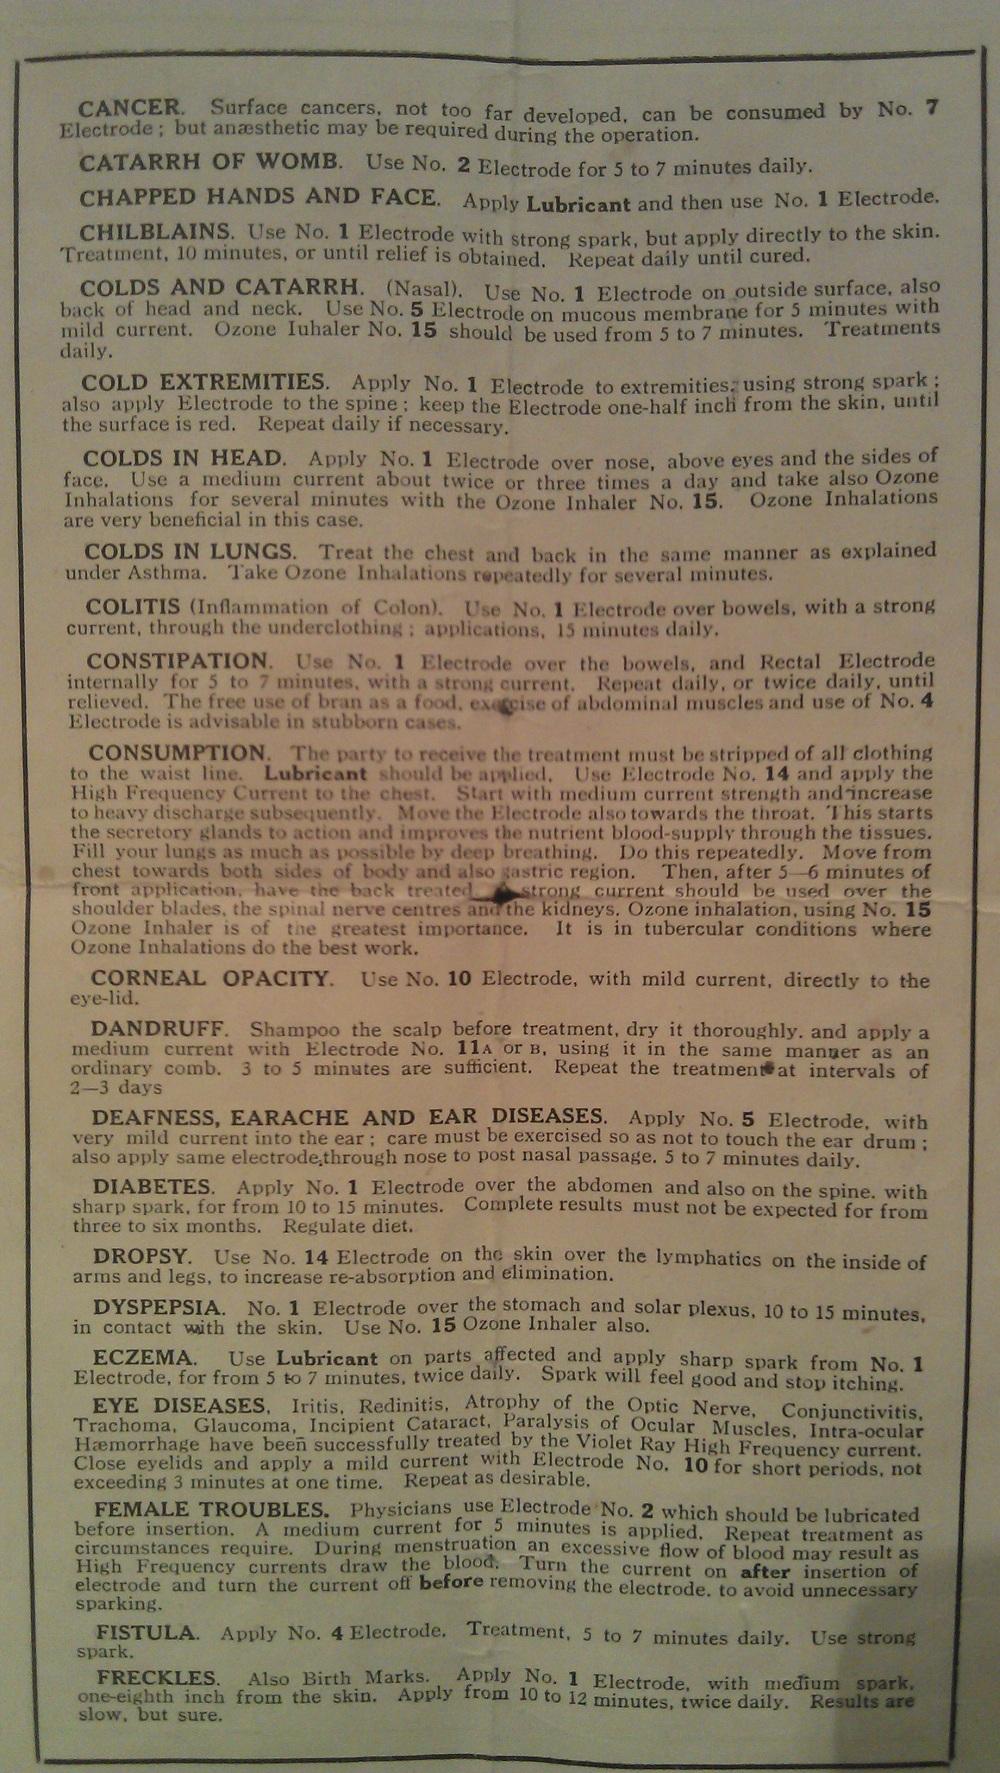 Dalbeattie museum cure-all machine treatment chart